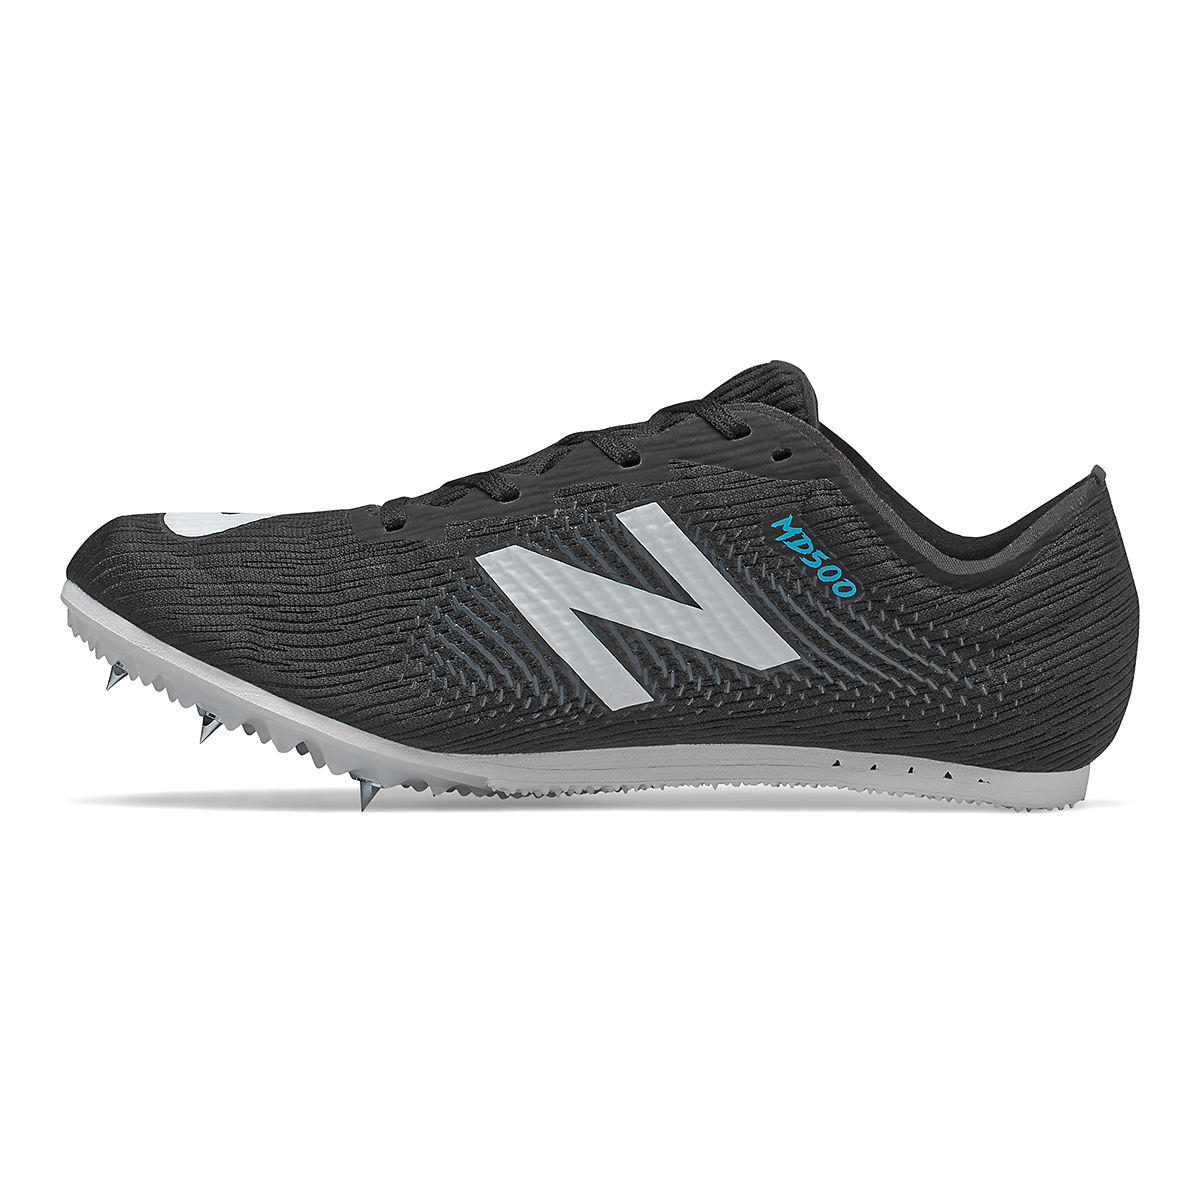 Women's New Balance MD500v7 Track Spikes - Color: Black/White - Size: 5.5 - Width: Regular, Black/White, large, image 2